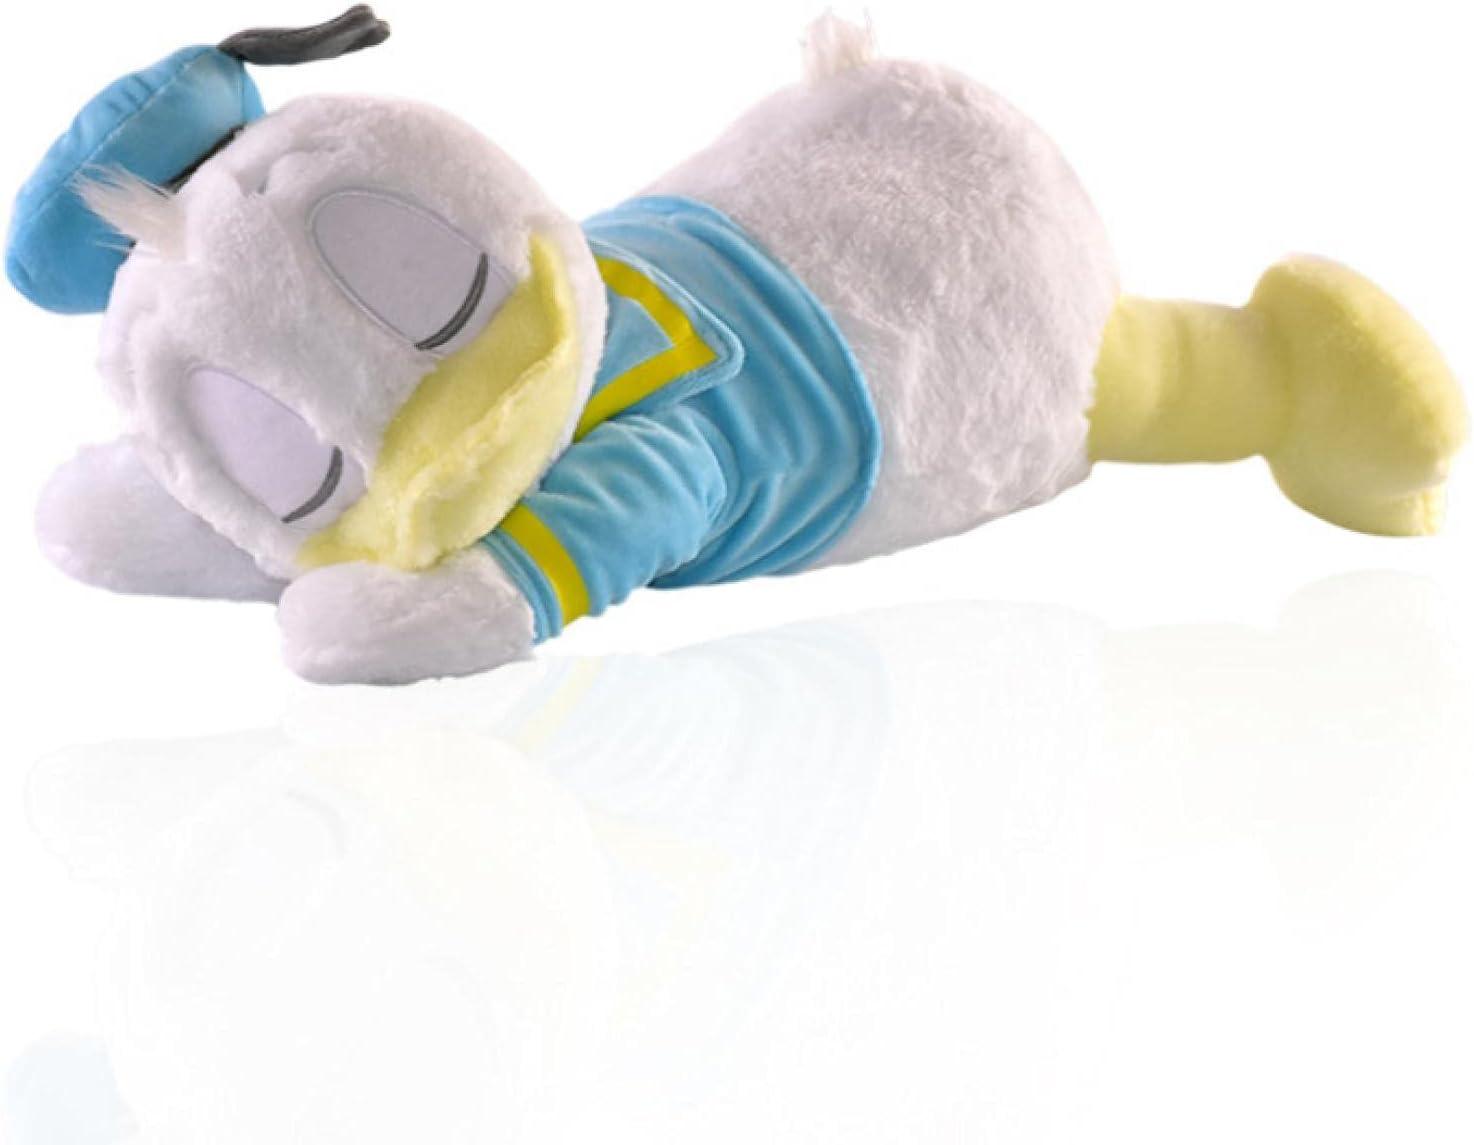 Anime Stitch Dumbo Pooh Winnie de Peluche de Juguete Almohada de muñeca para Dormir muñeca de Animal de Dibujos Animados de Peluche bebé / niños 50cm Pato Donald